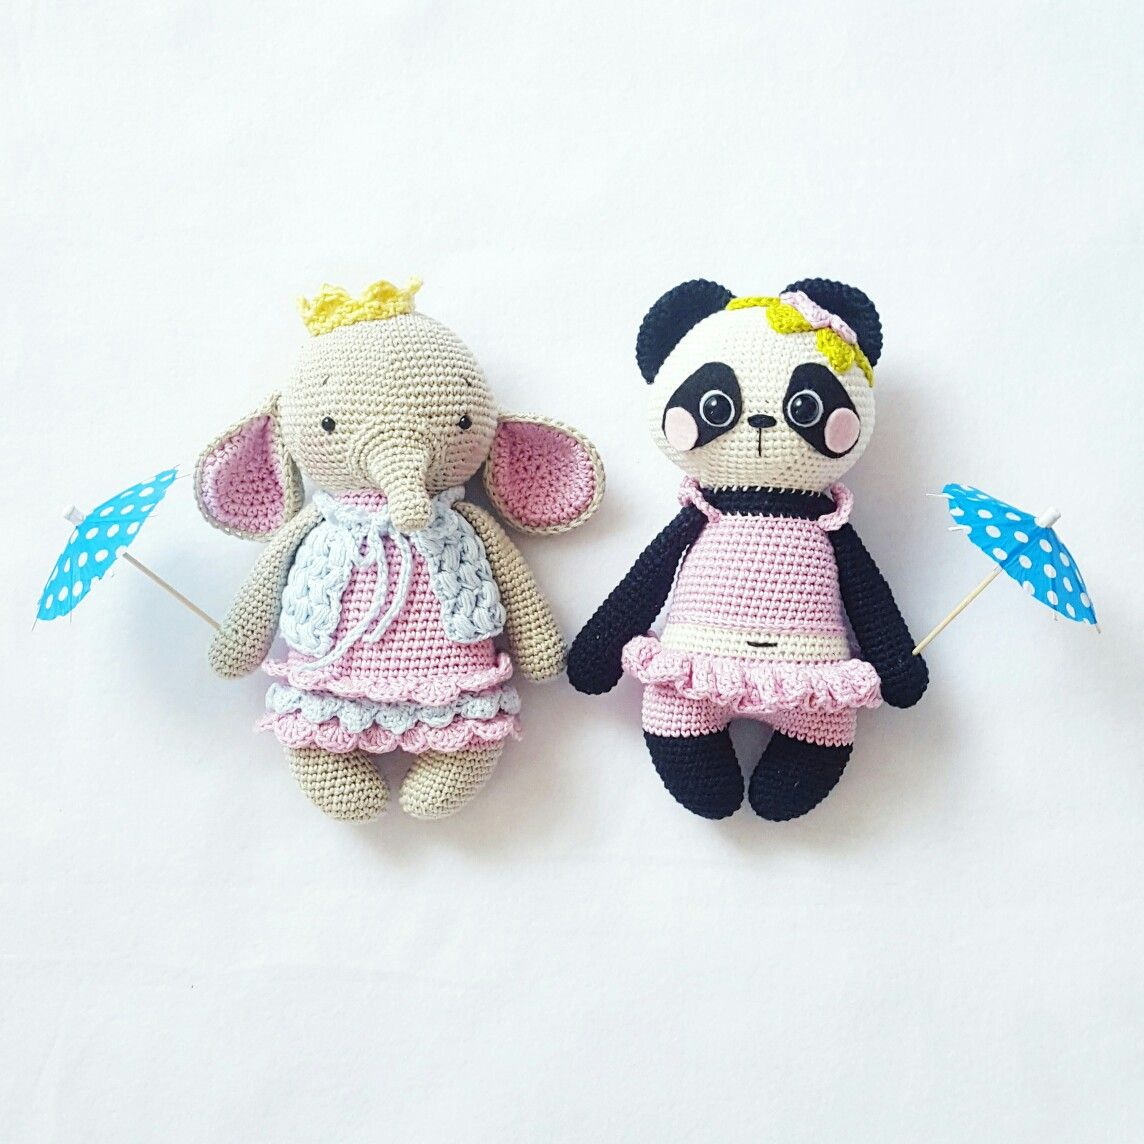 Amigurumi Panda häkeln   Supergurumi   1144x1144